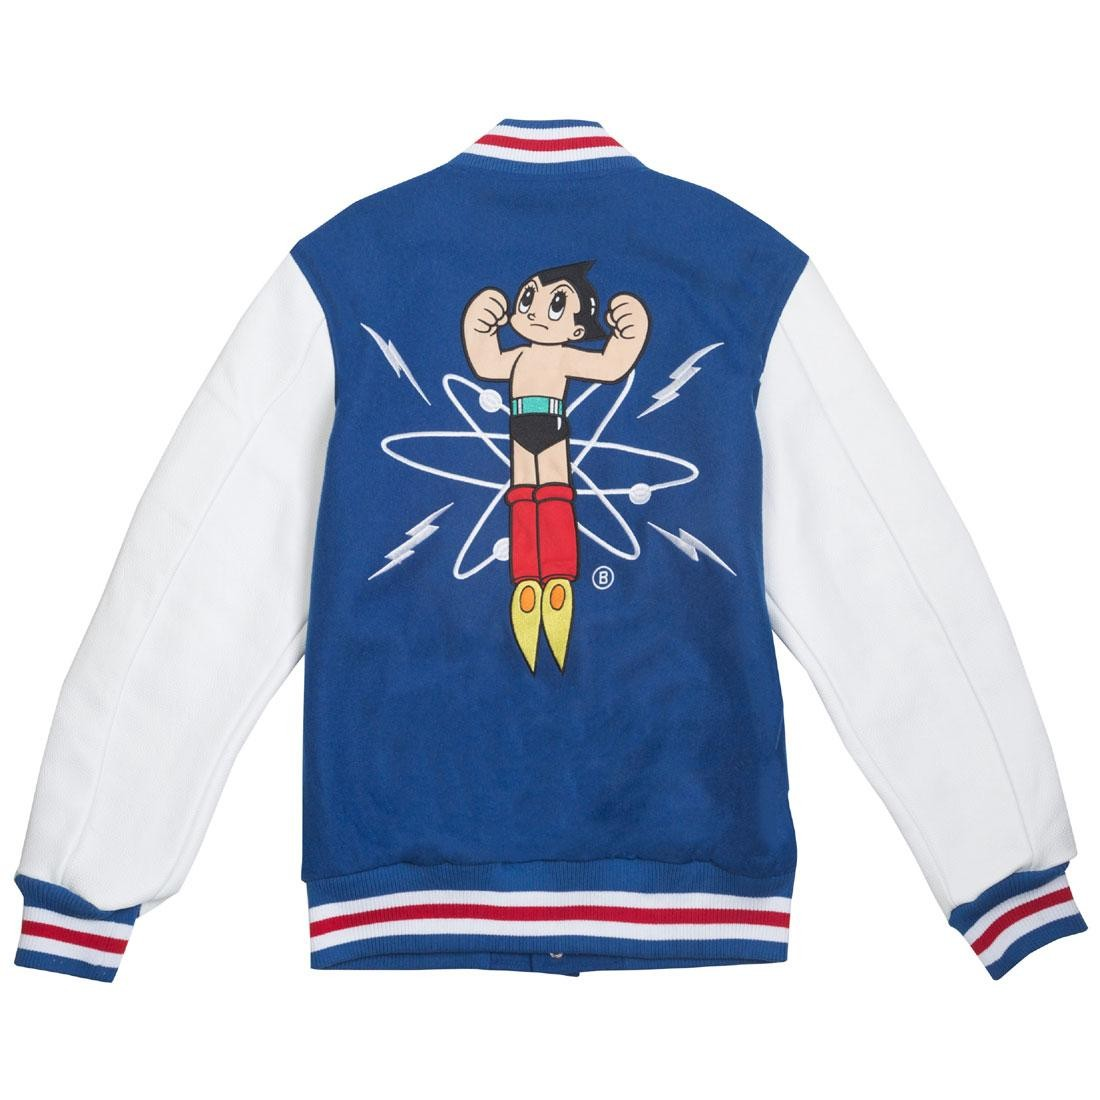 BAIT x Astro Boy Men Launch Varsity Jacket (blue white)